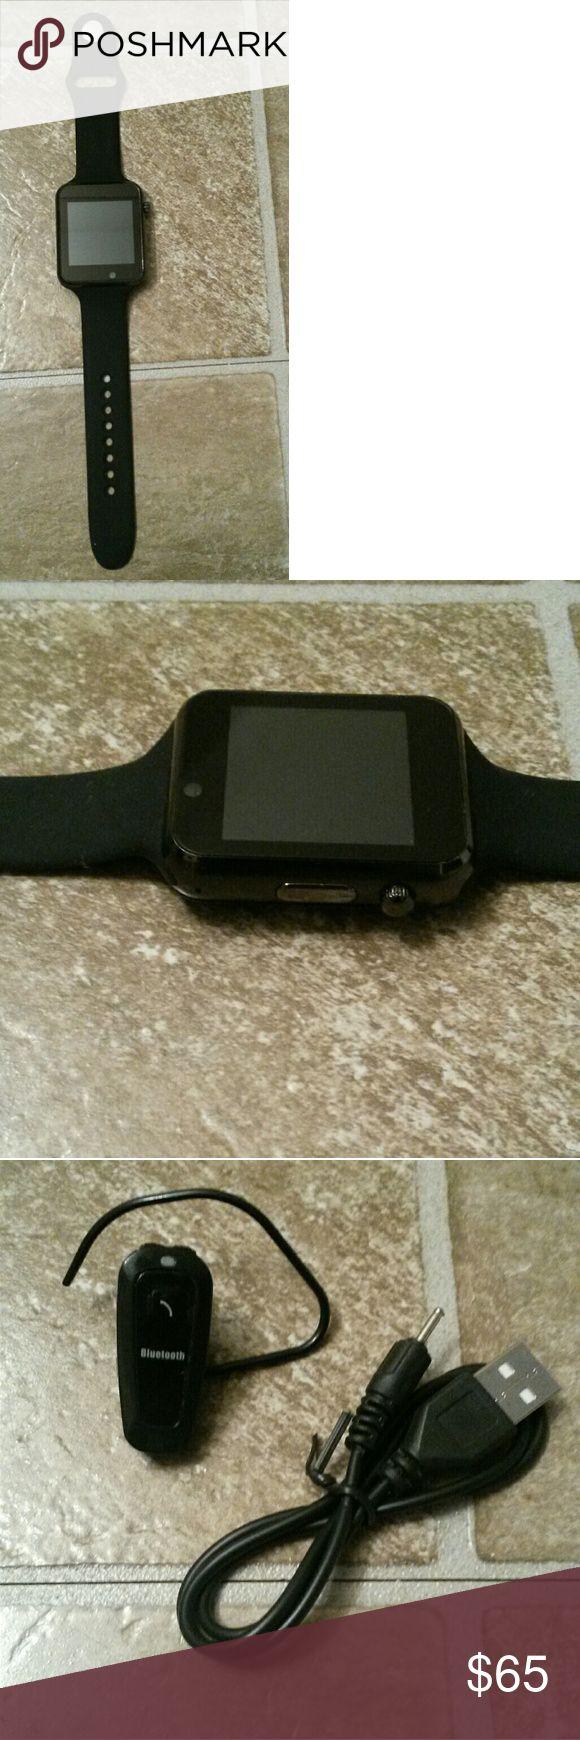 Bluetooth & simcard smartwatch & Bluetooth headset Bluetooth & simcard smartwatch & Bluetooth headset android smartwatch Other